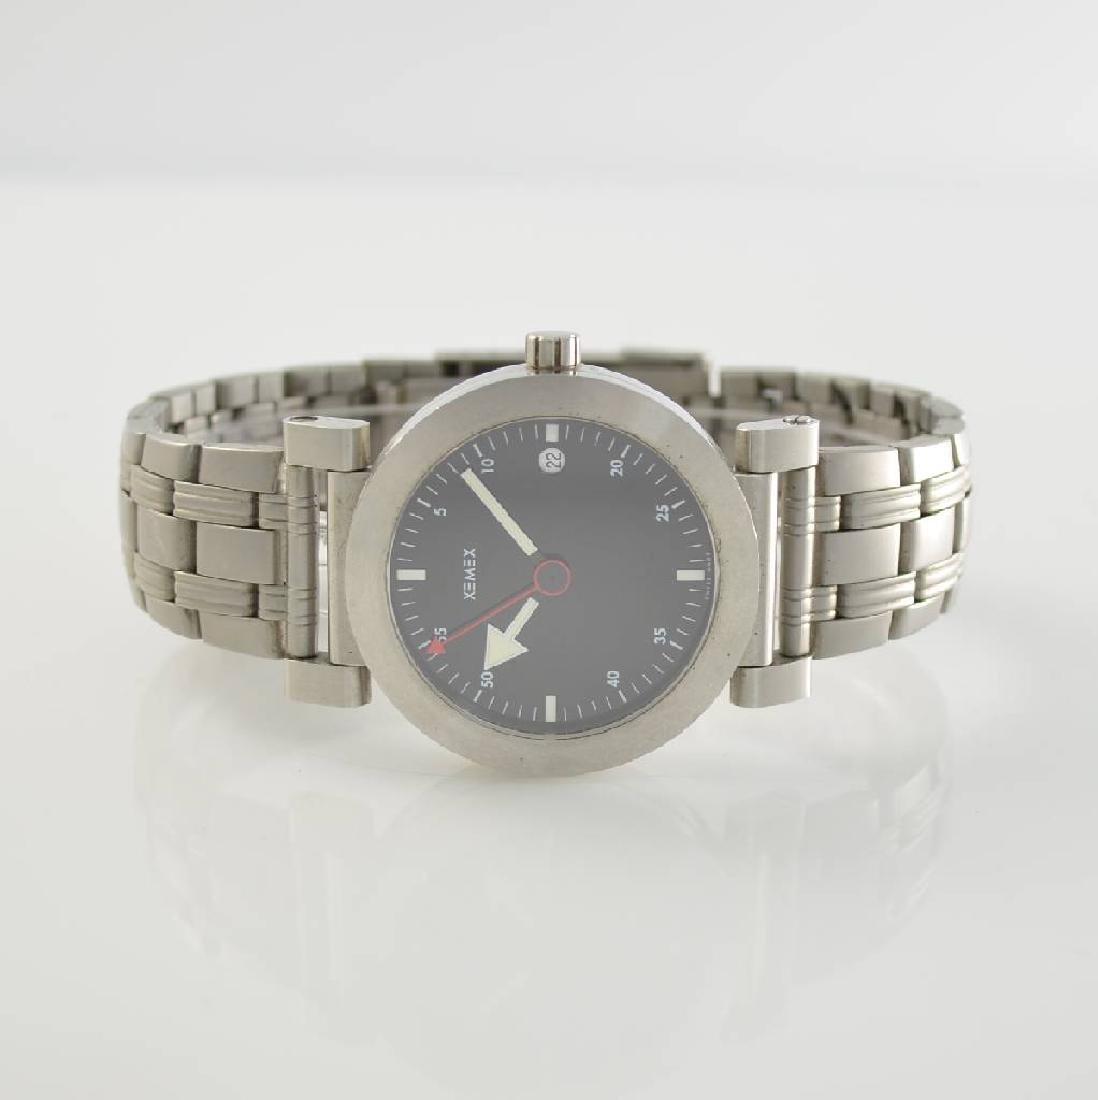 XEMEX rare gents wristwatch Offraod Design Külling